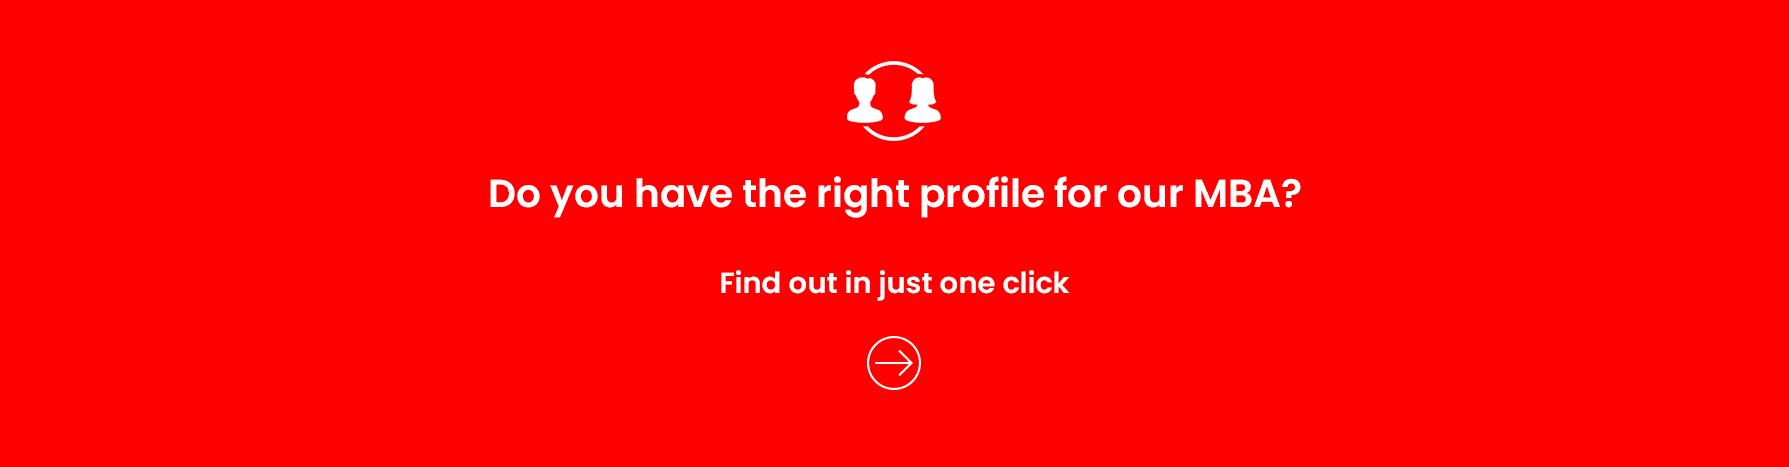 Feedback on Your Profile